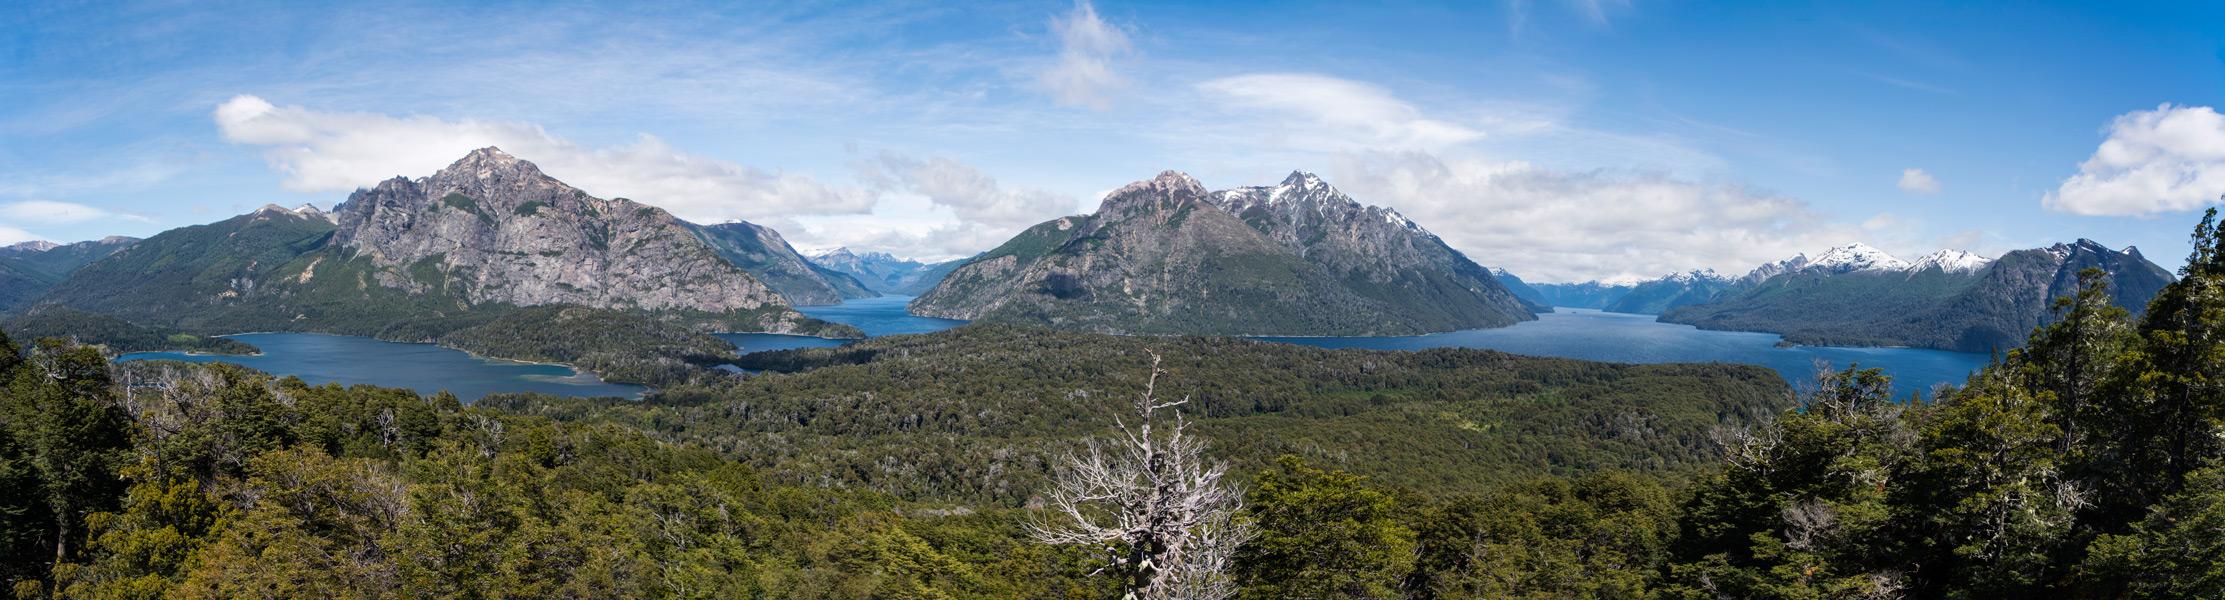 Panorama-cerro-llao-llao-randonnee-trekking-bariloche-argentine